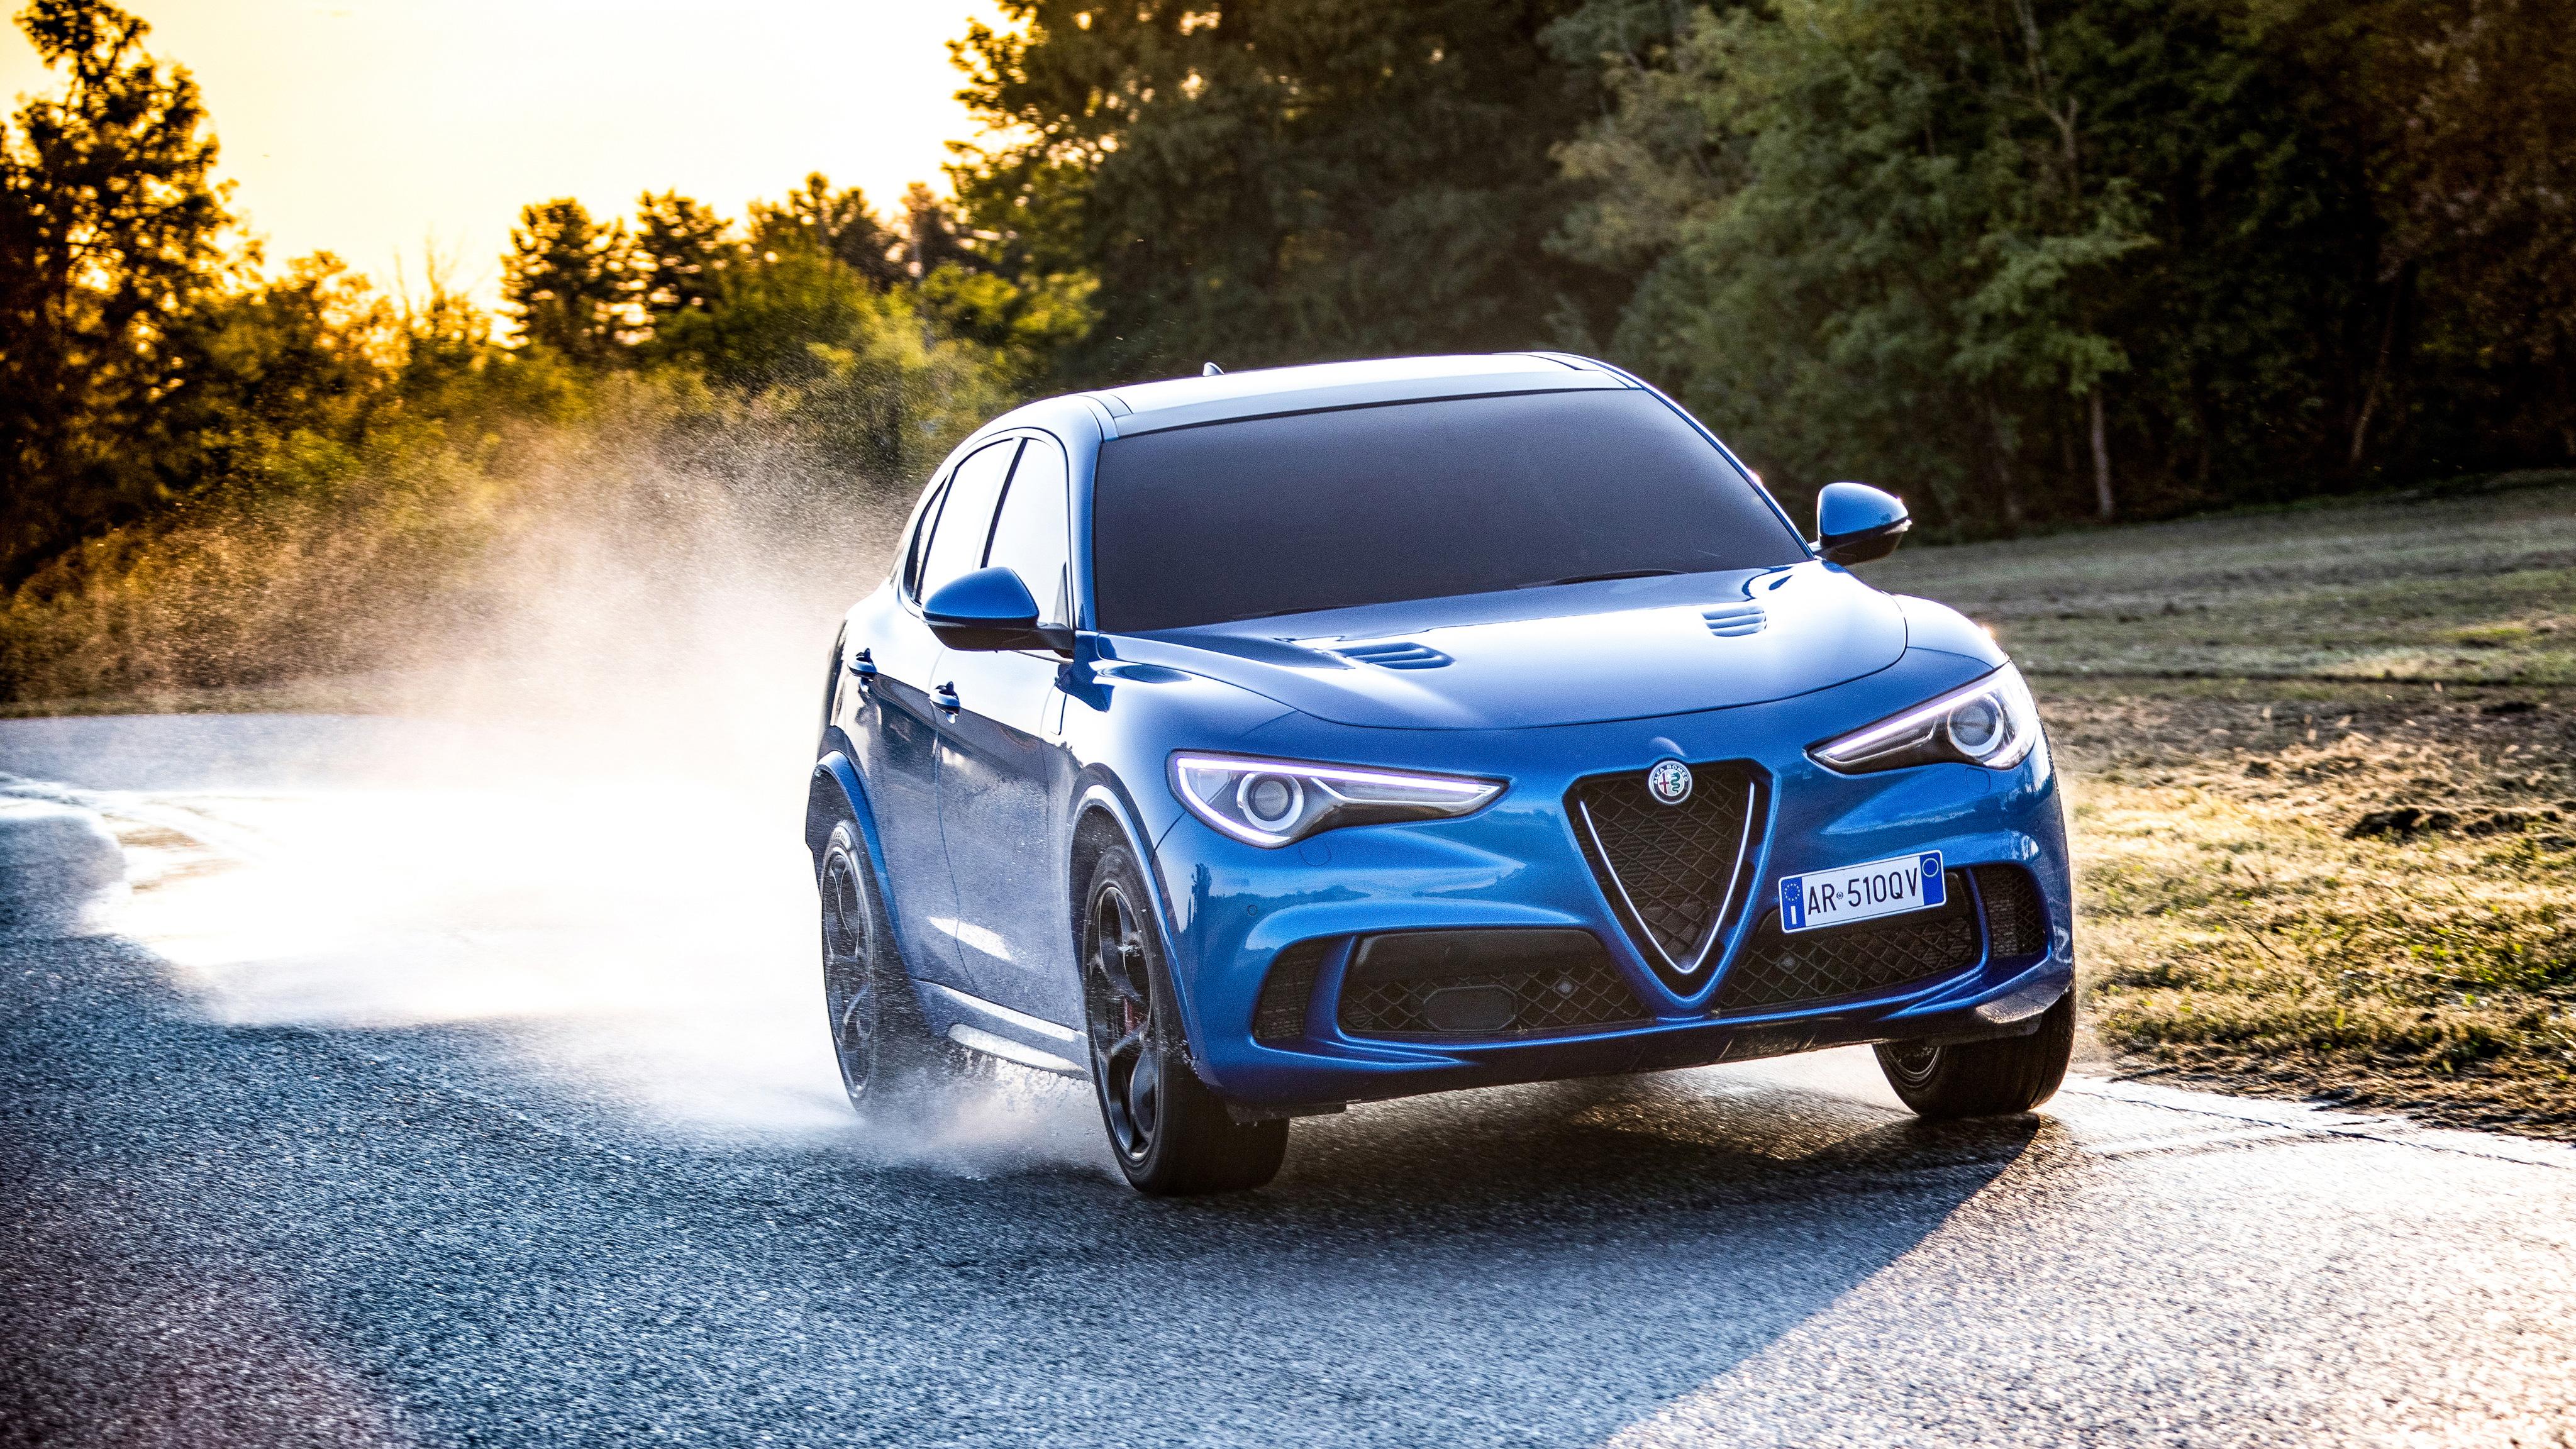 Alfa Romeo Stelvio Quadrifoglio Hd Cars 4k Wallpapers